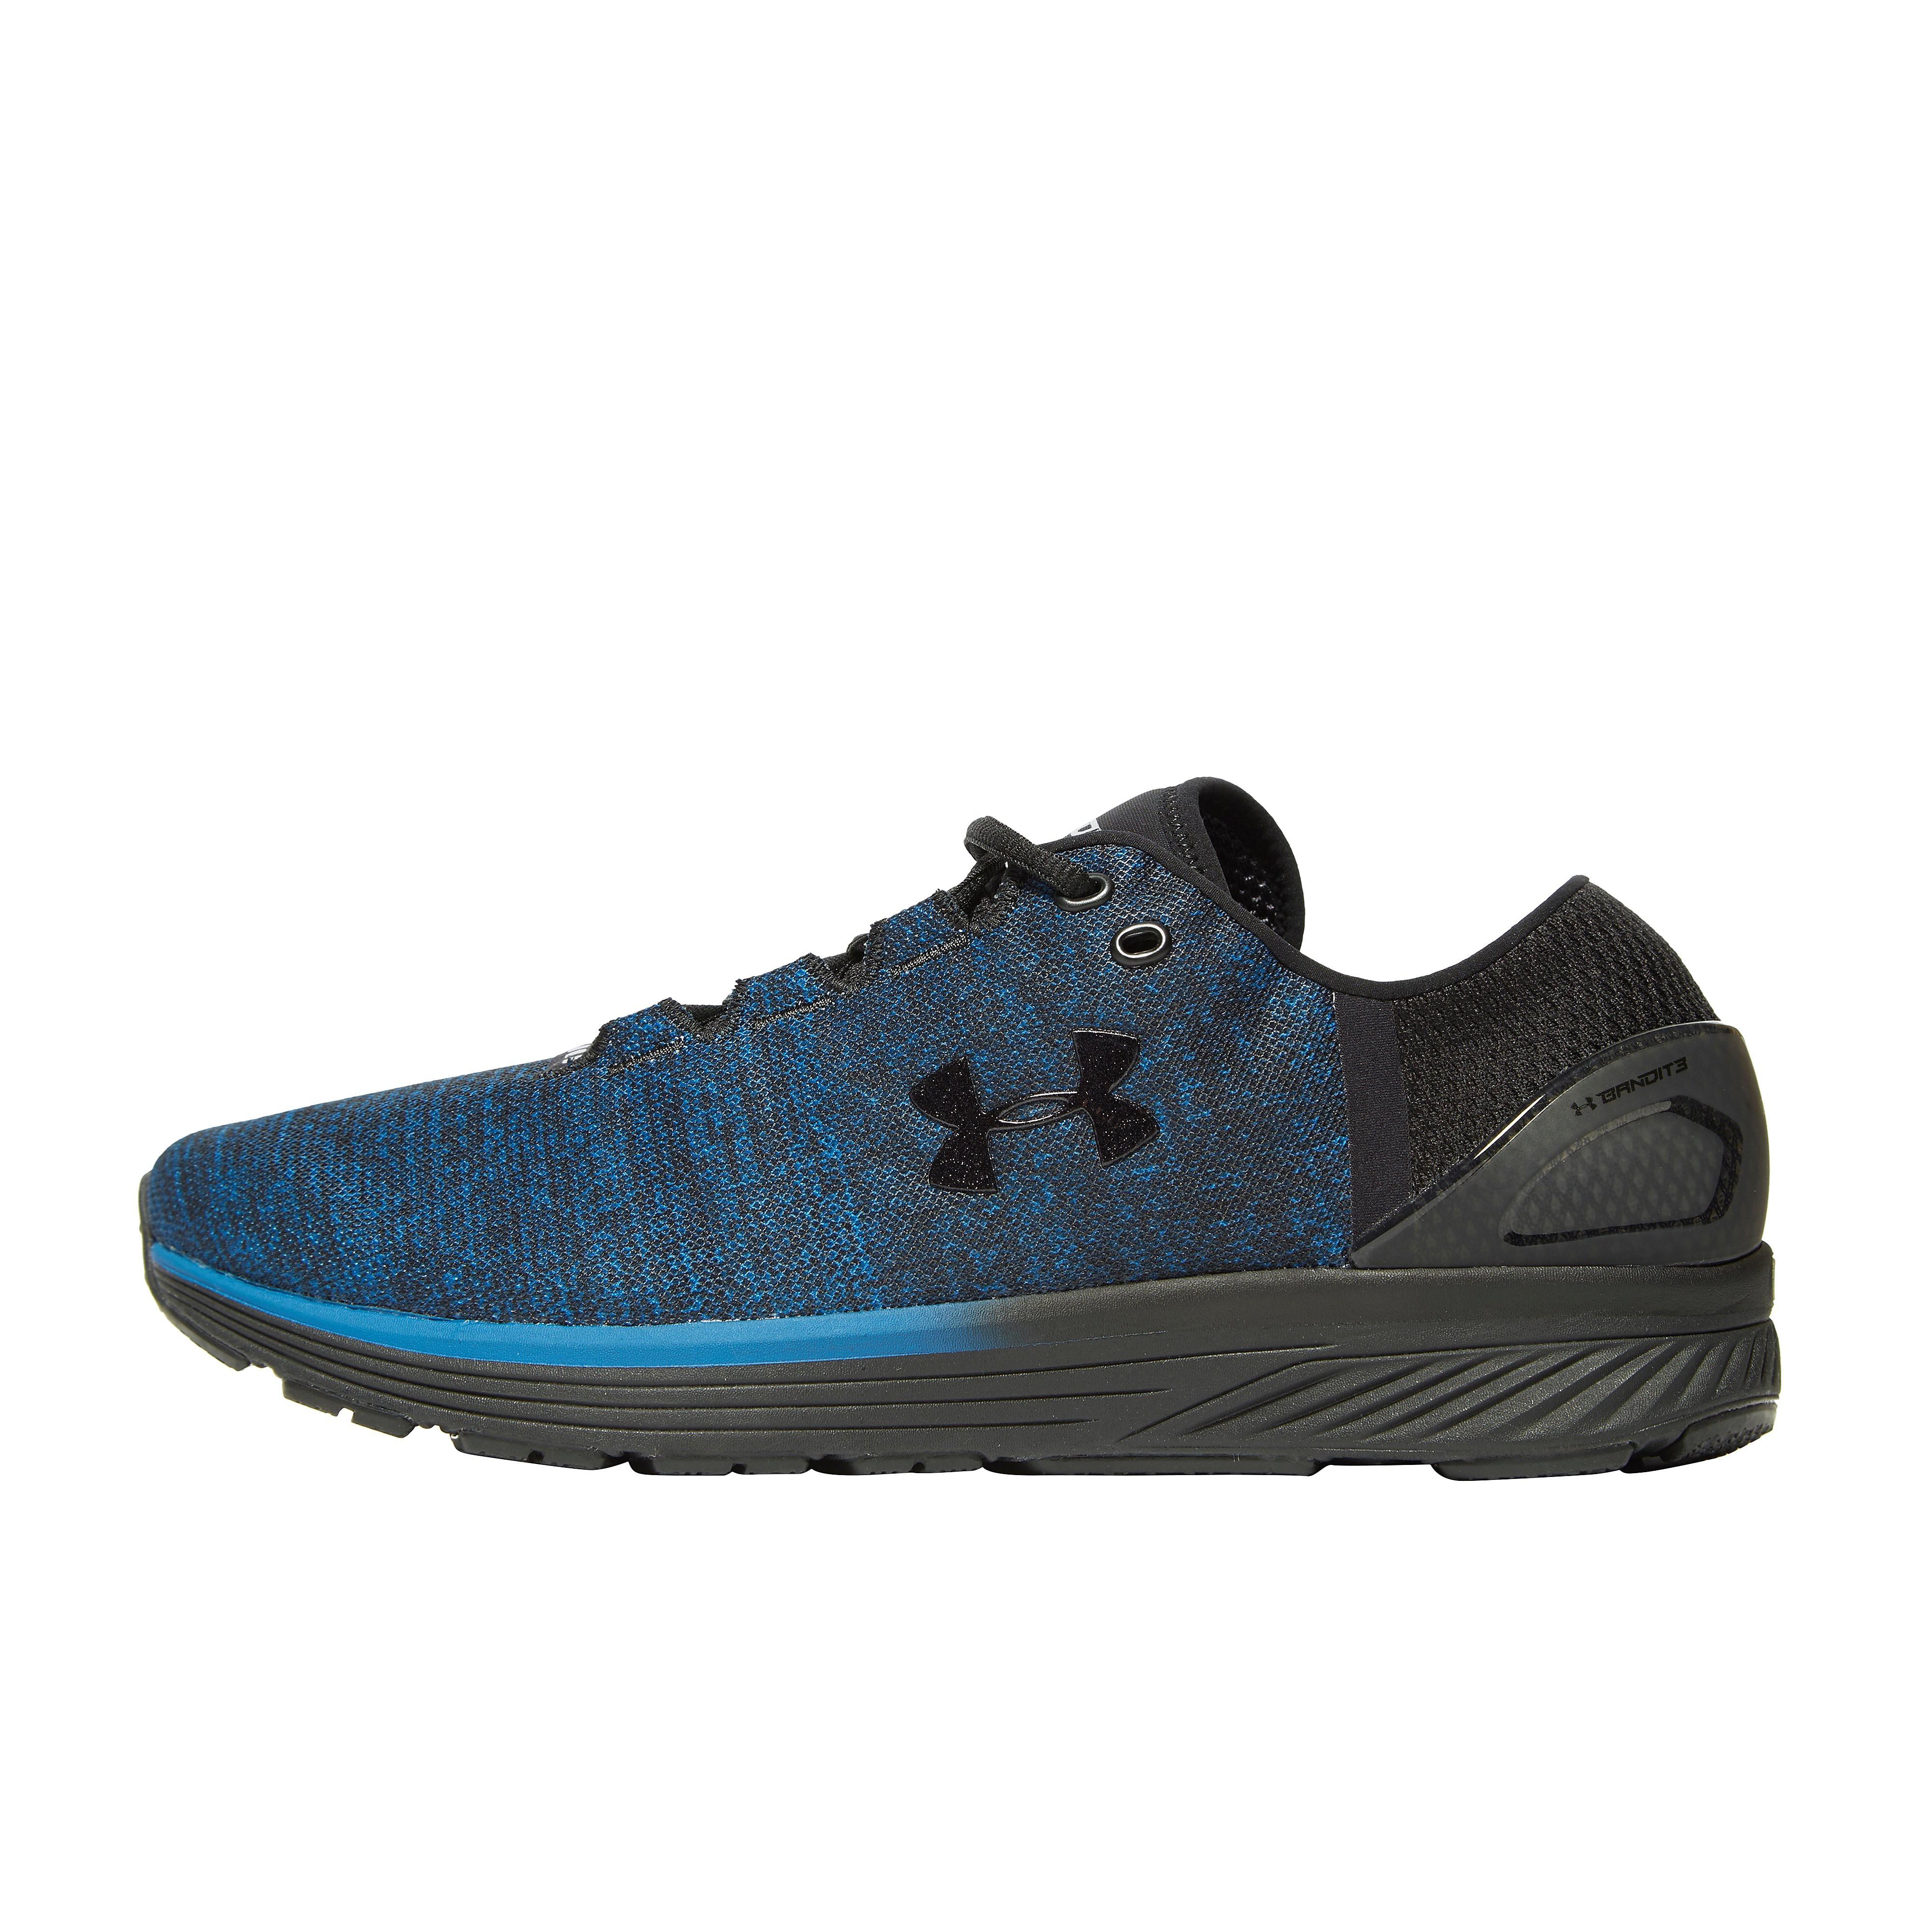 Men's Under Armour Bandit Running Shoes - Black/Blue, Black/Blue